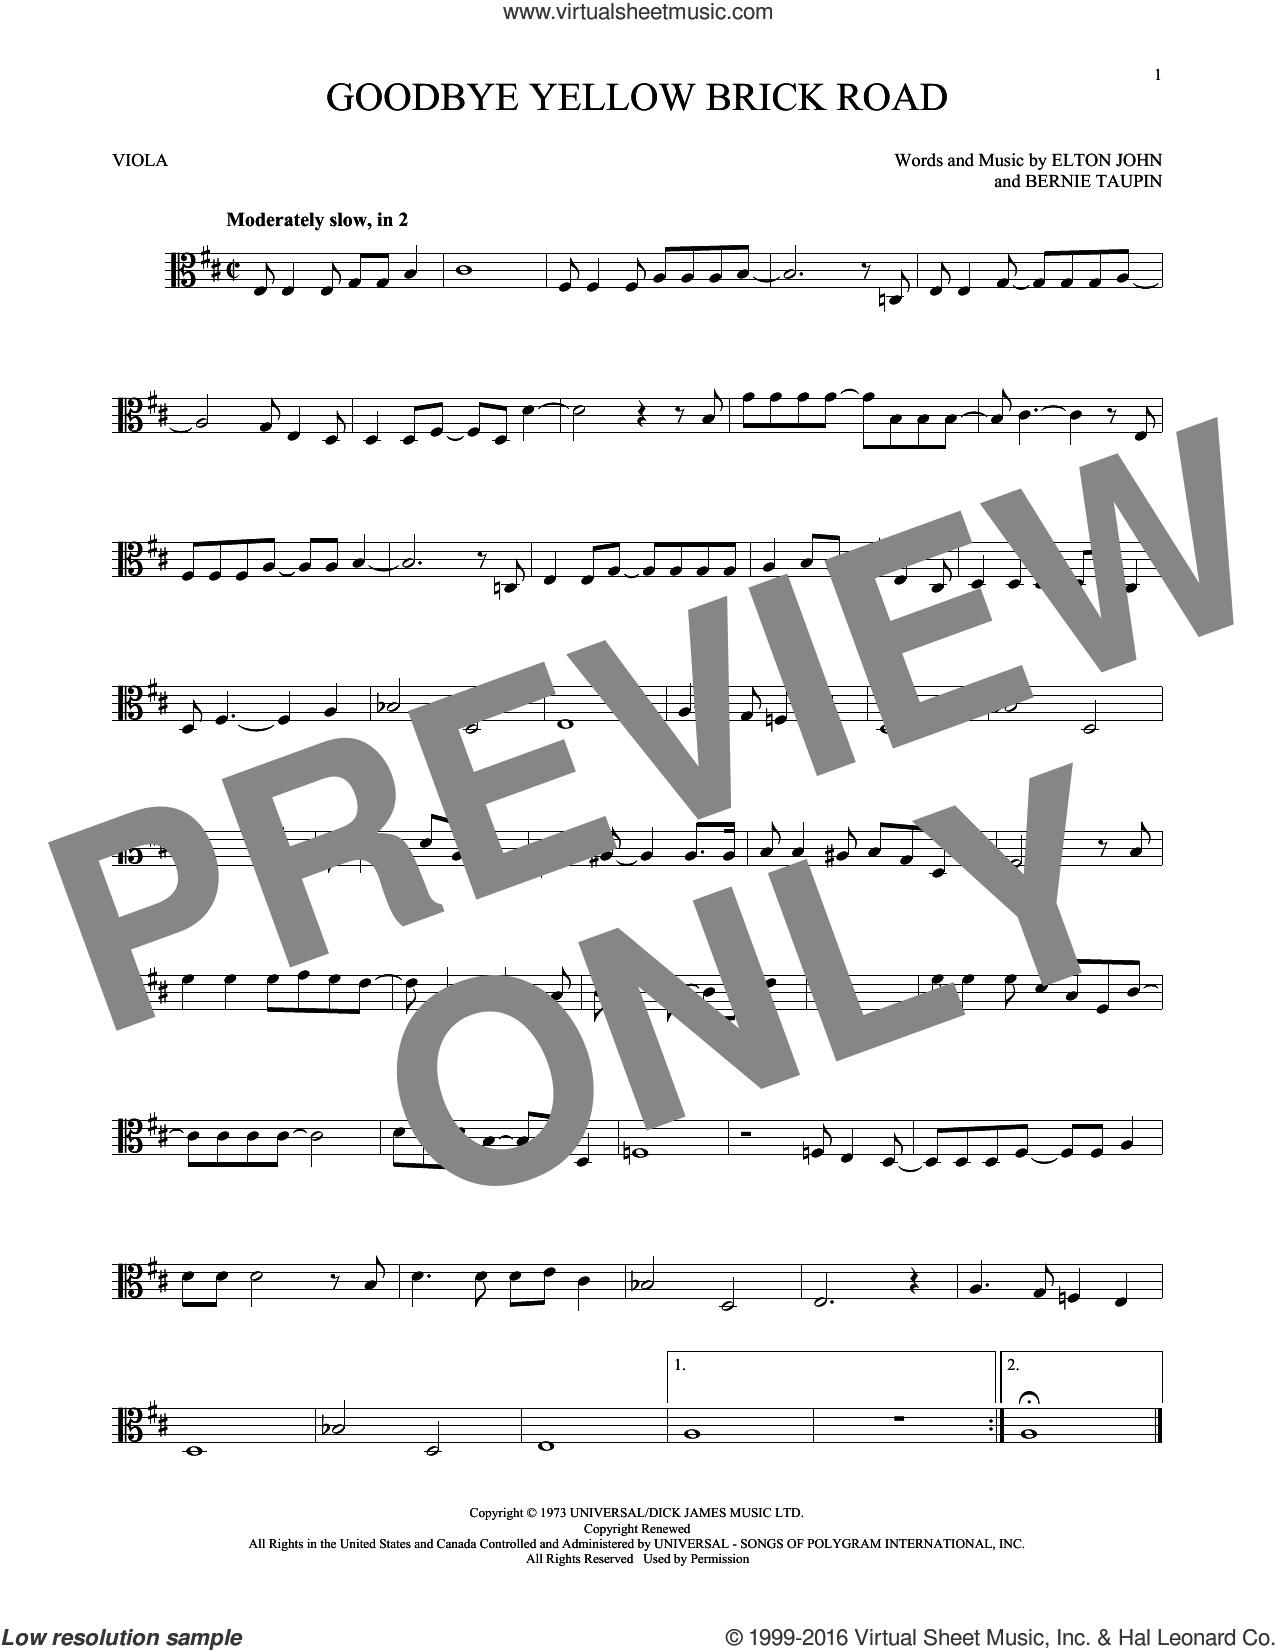 Goodbye Yellow Brick Road sheet music for viola solo by Elton John and Bernie Taupin, intermediate skill level